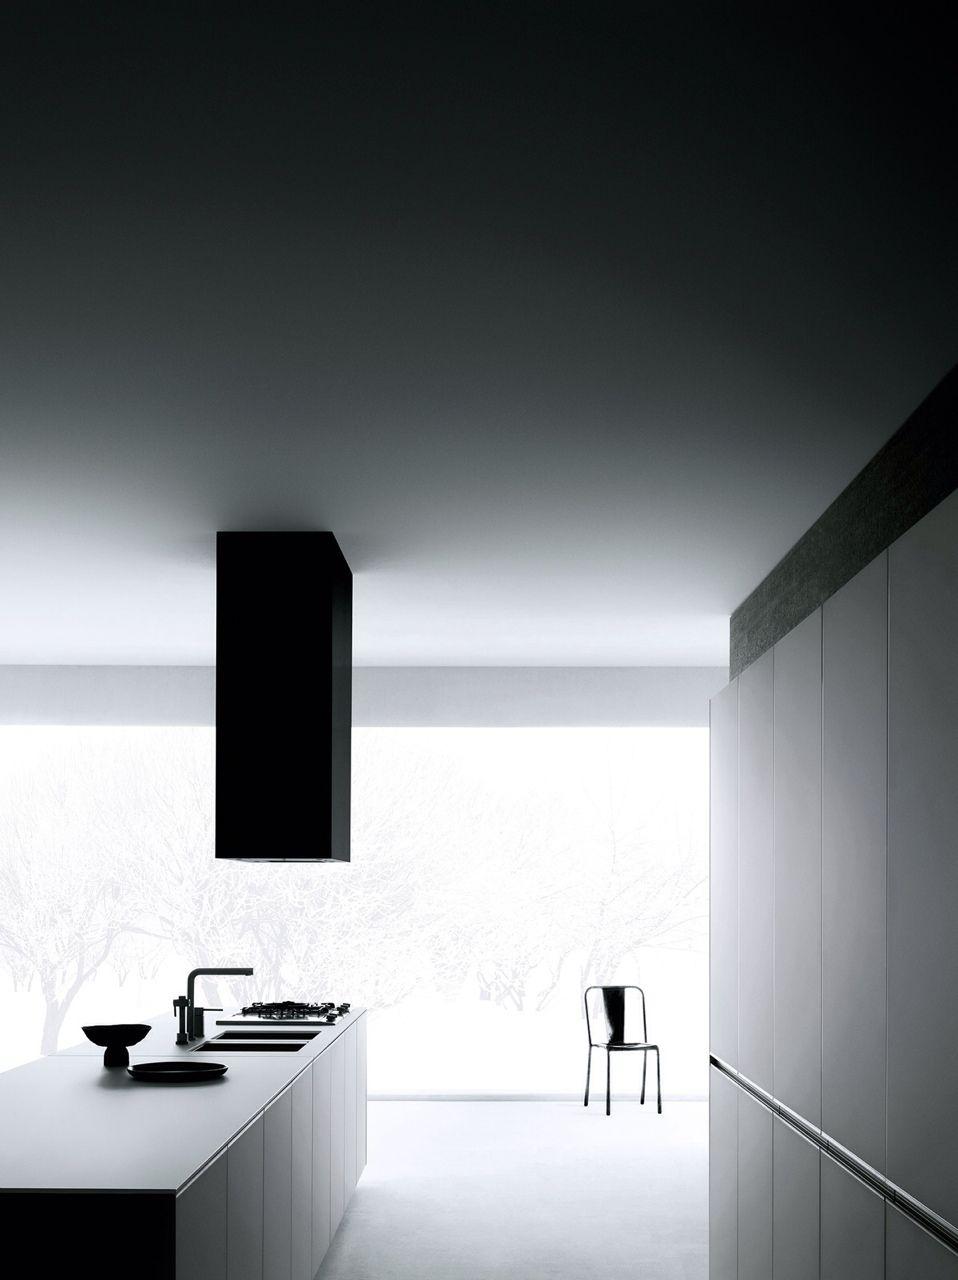 High Quality Dark Ambience | Stylish Black Kitchen | Minimal Living Style | Modern  Minimalist Interiors | Contemporary Amazing Pictures